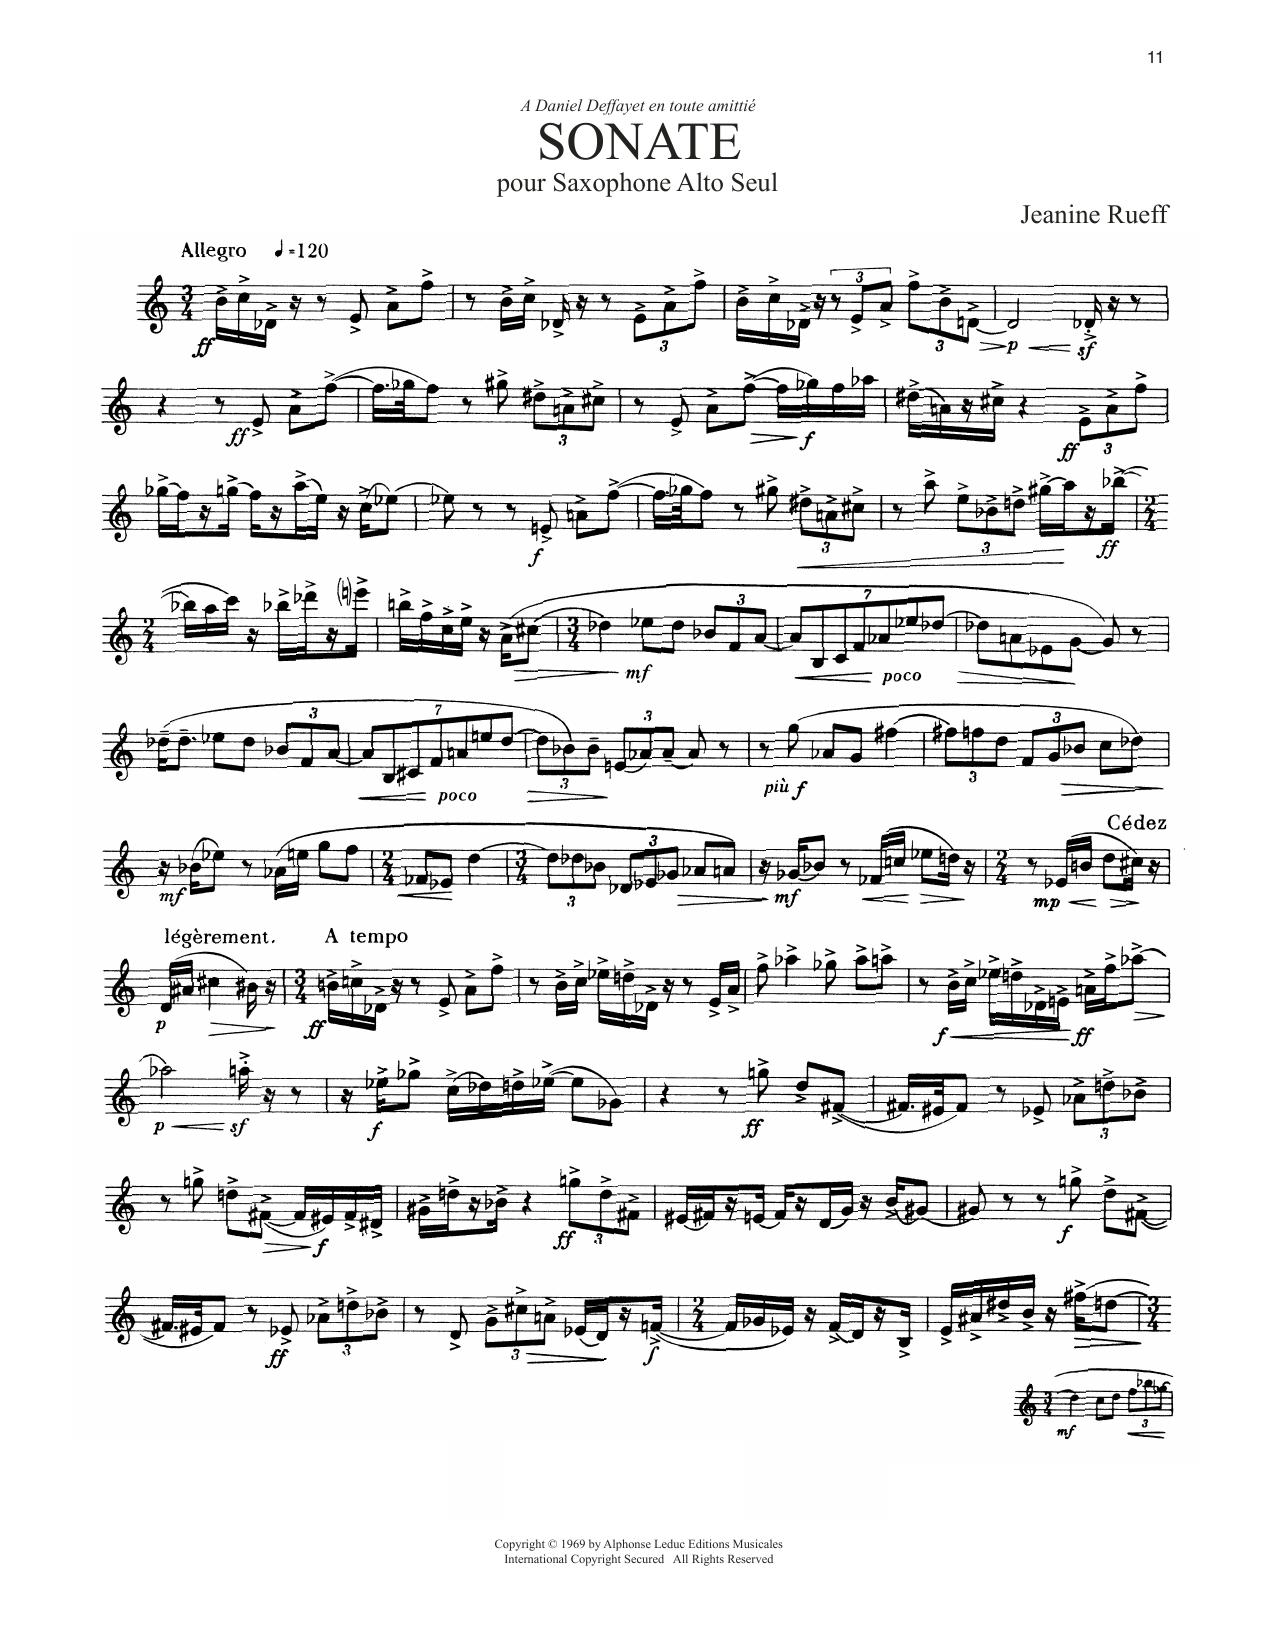 Sonate Sheet Music